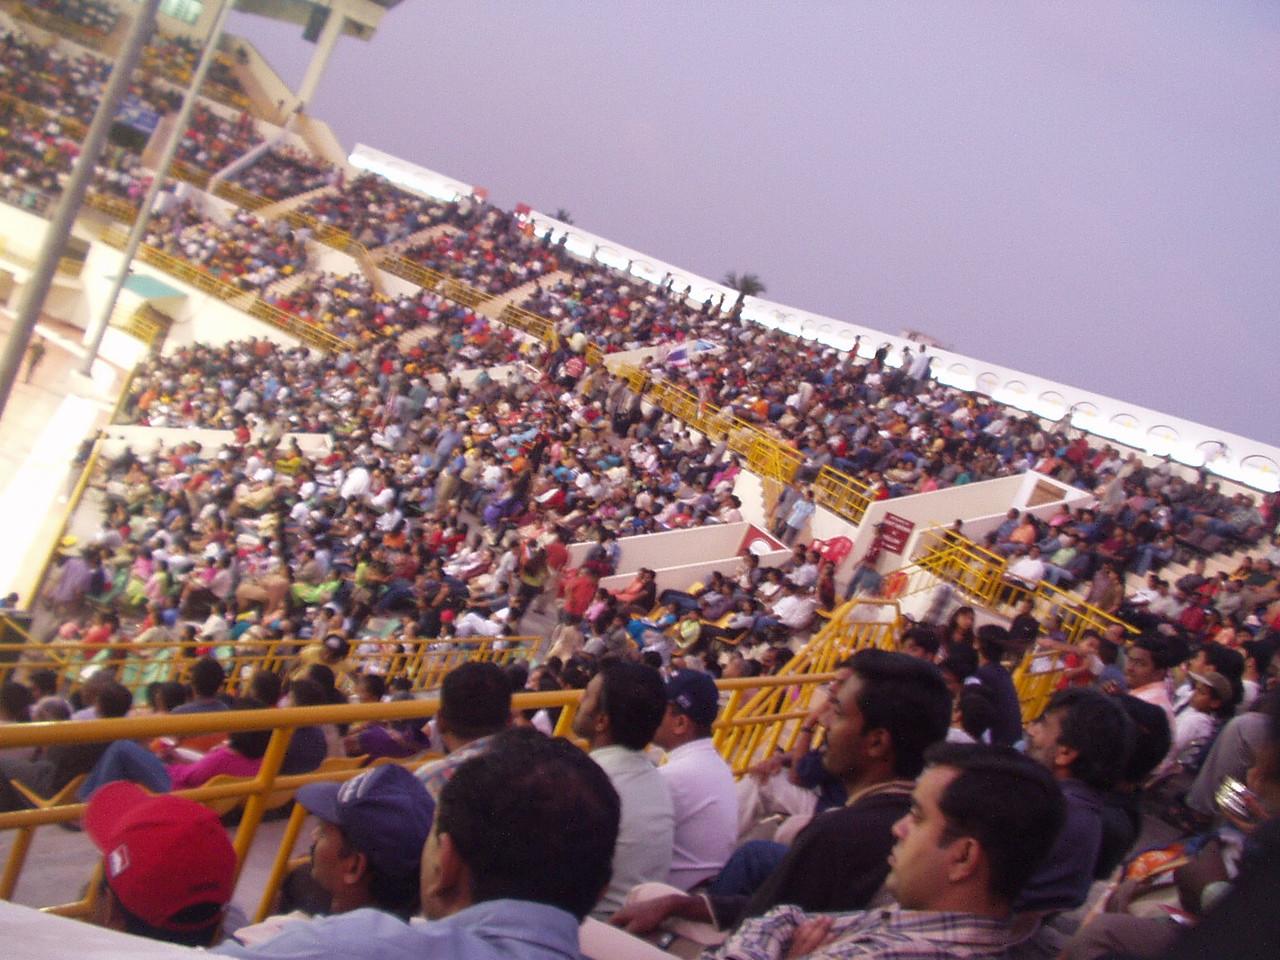 10 January: Crowds